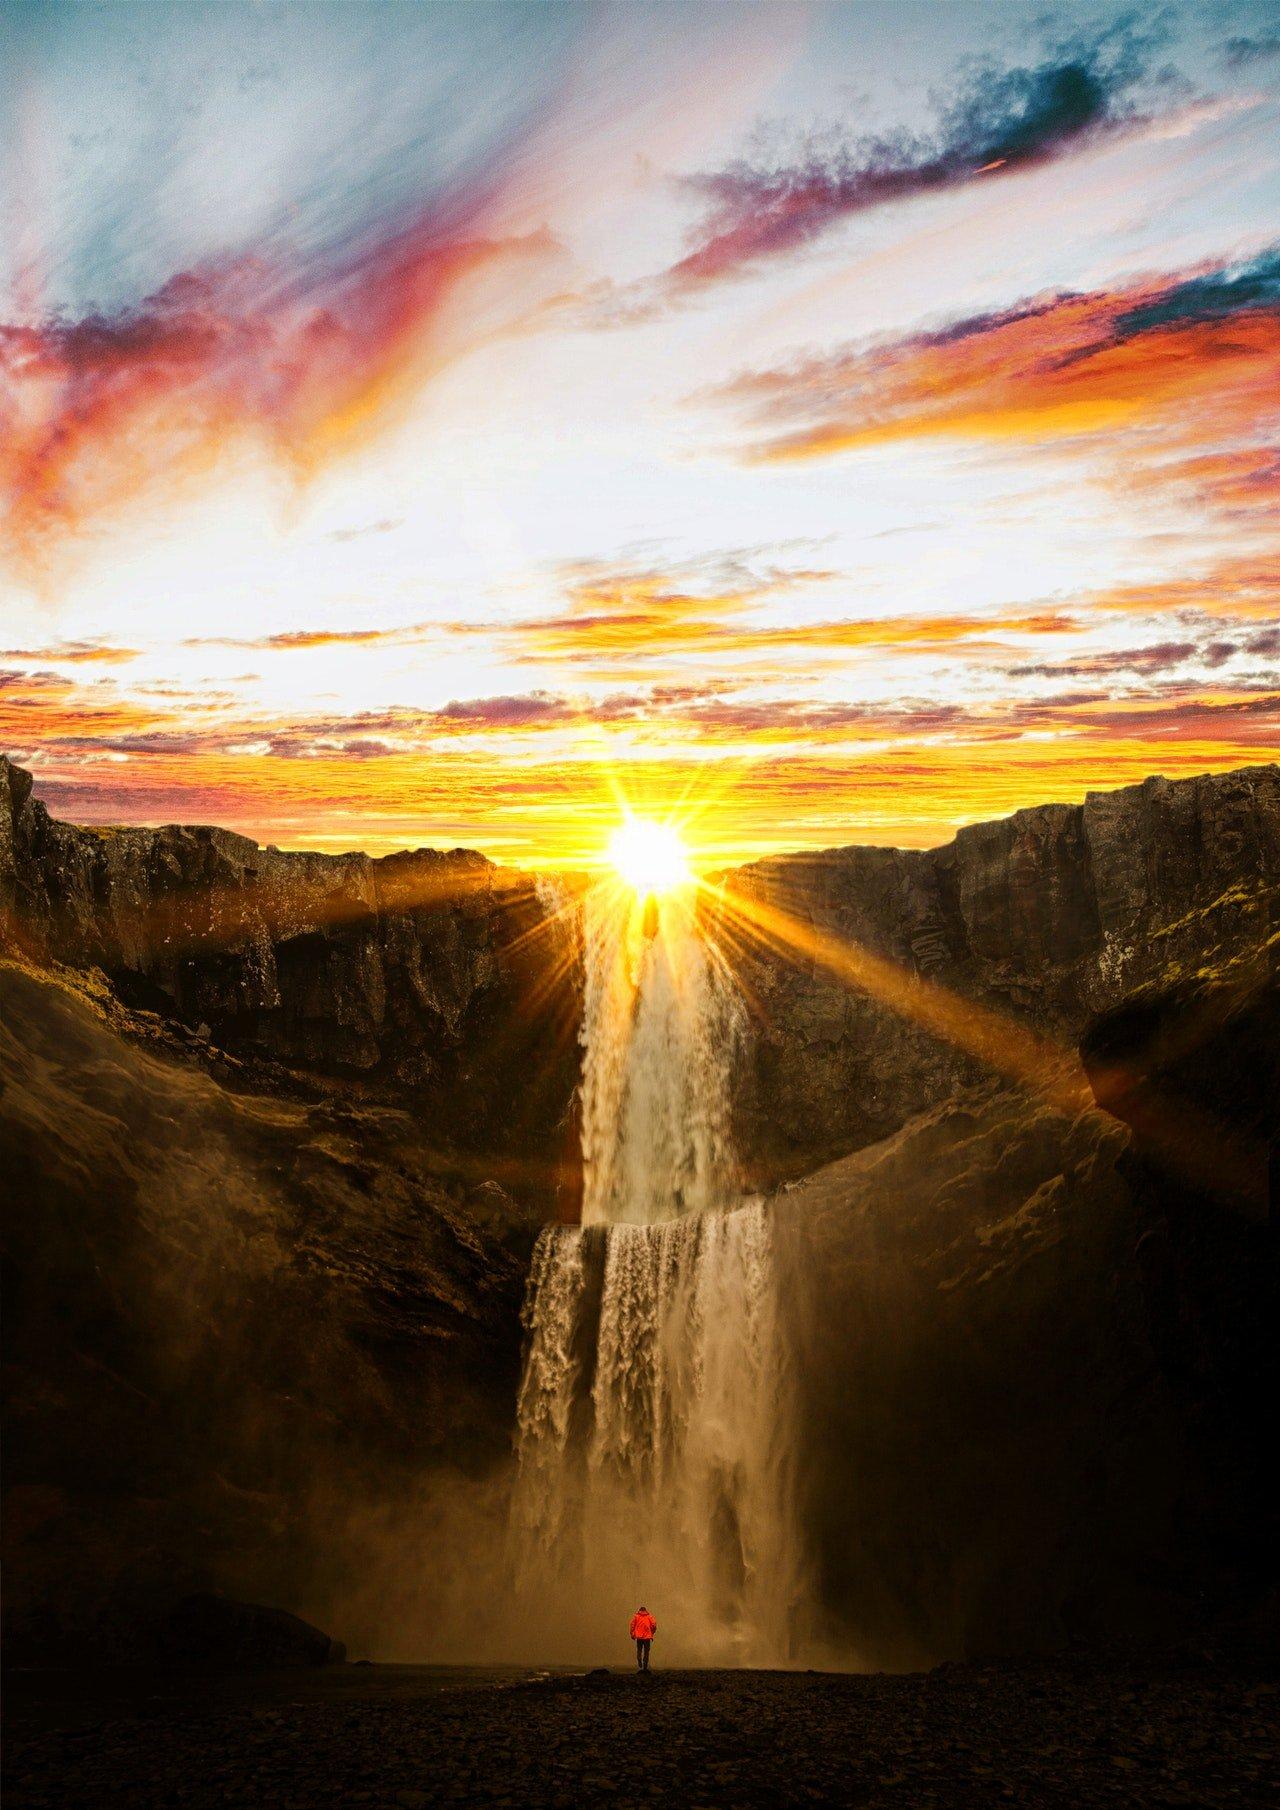 Wasserfall mit Sonnenuntergang